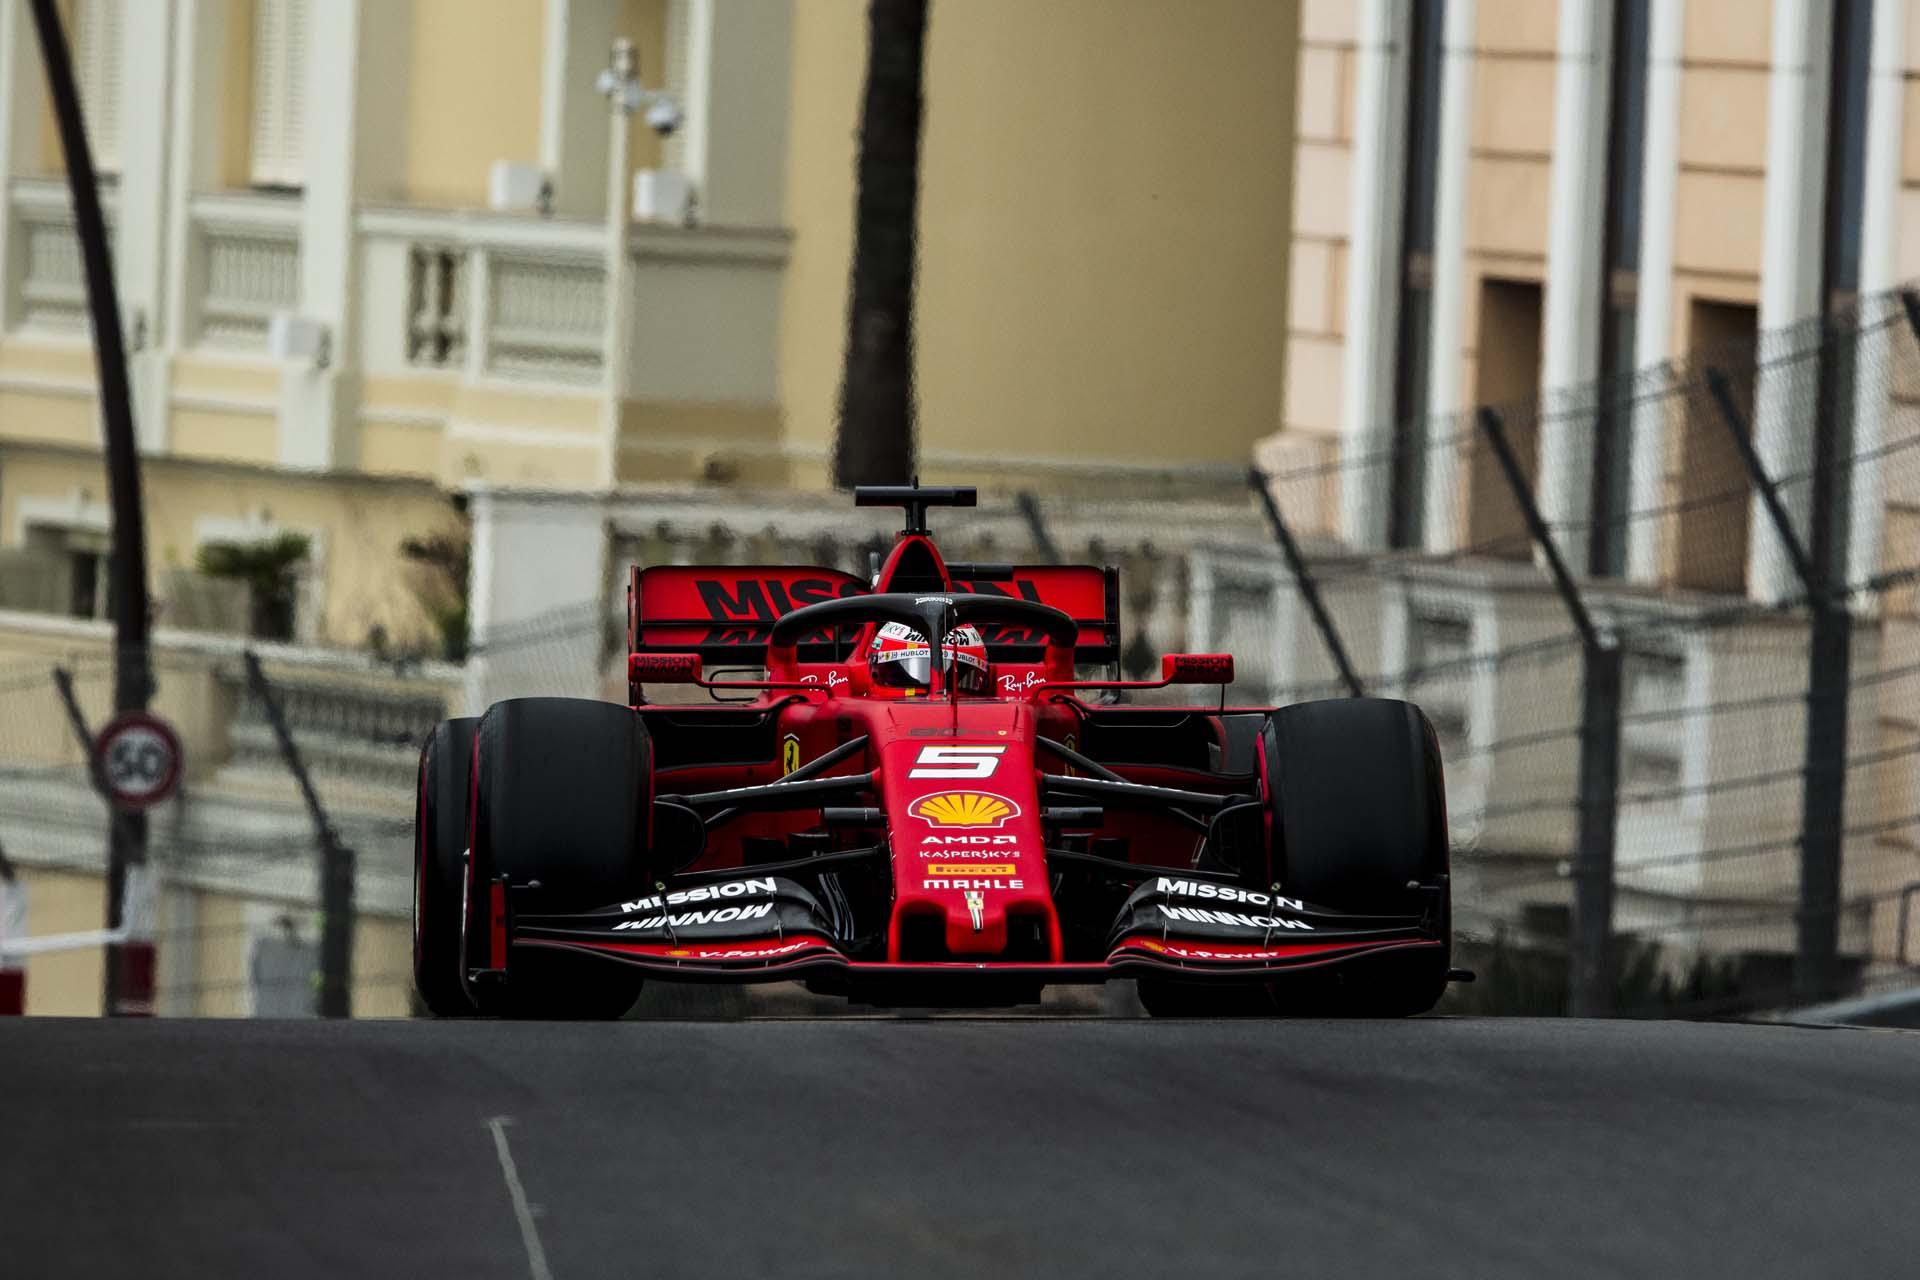 MonacoGP2019_THU_Ferrari_190014_monaco